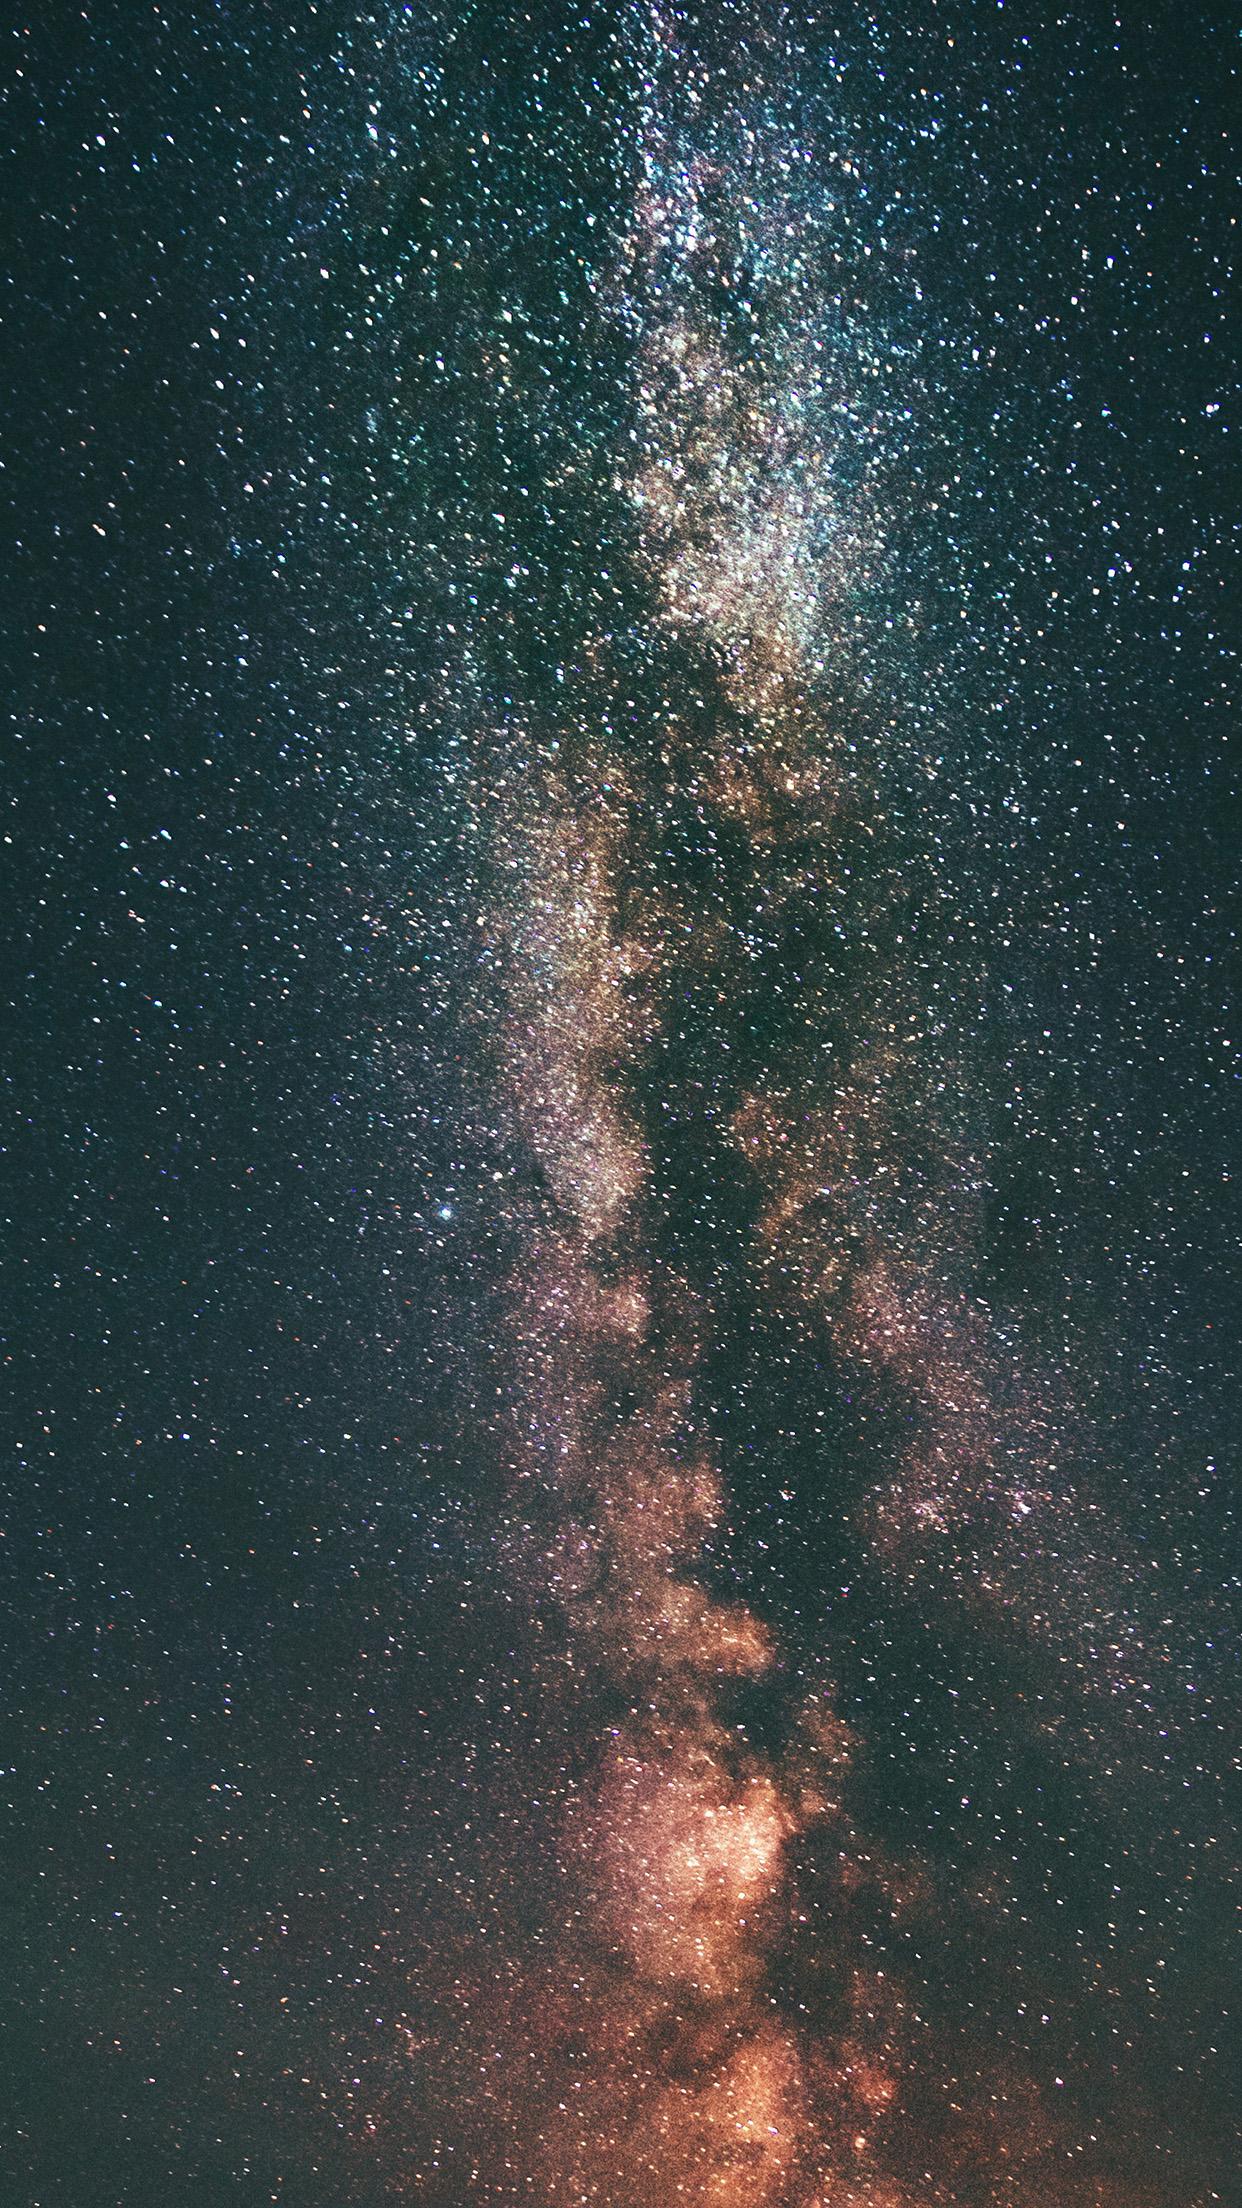 Nt06-night-sky-star-nature-wallpaper